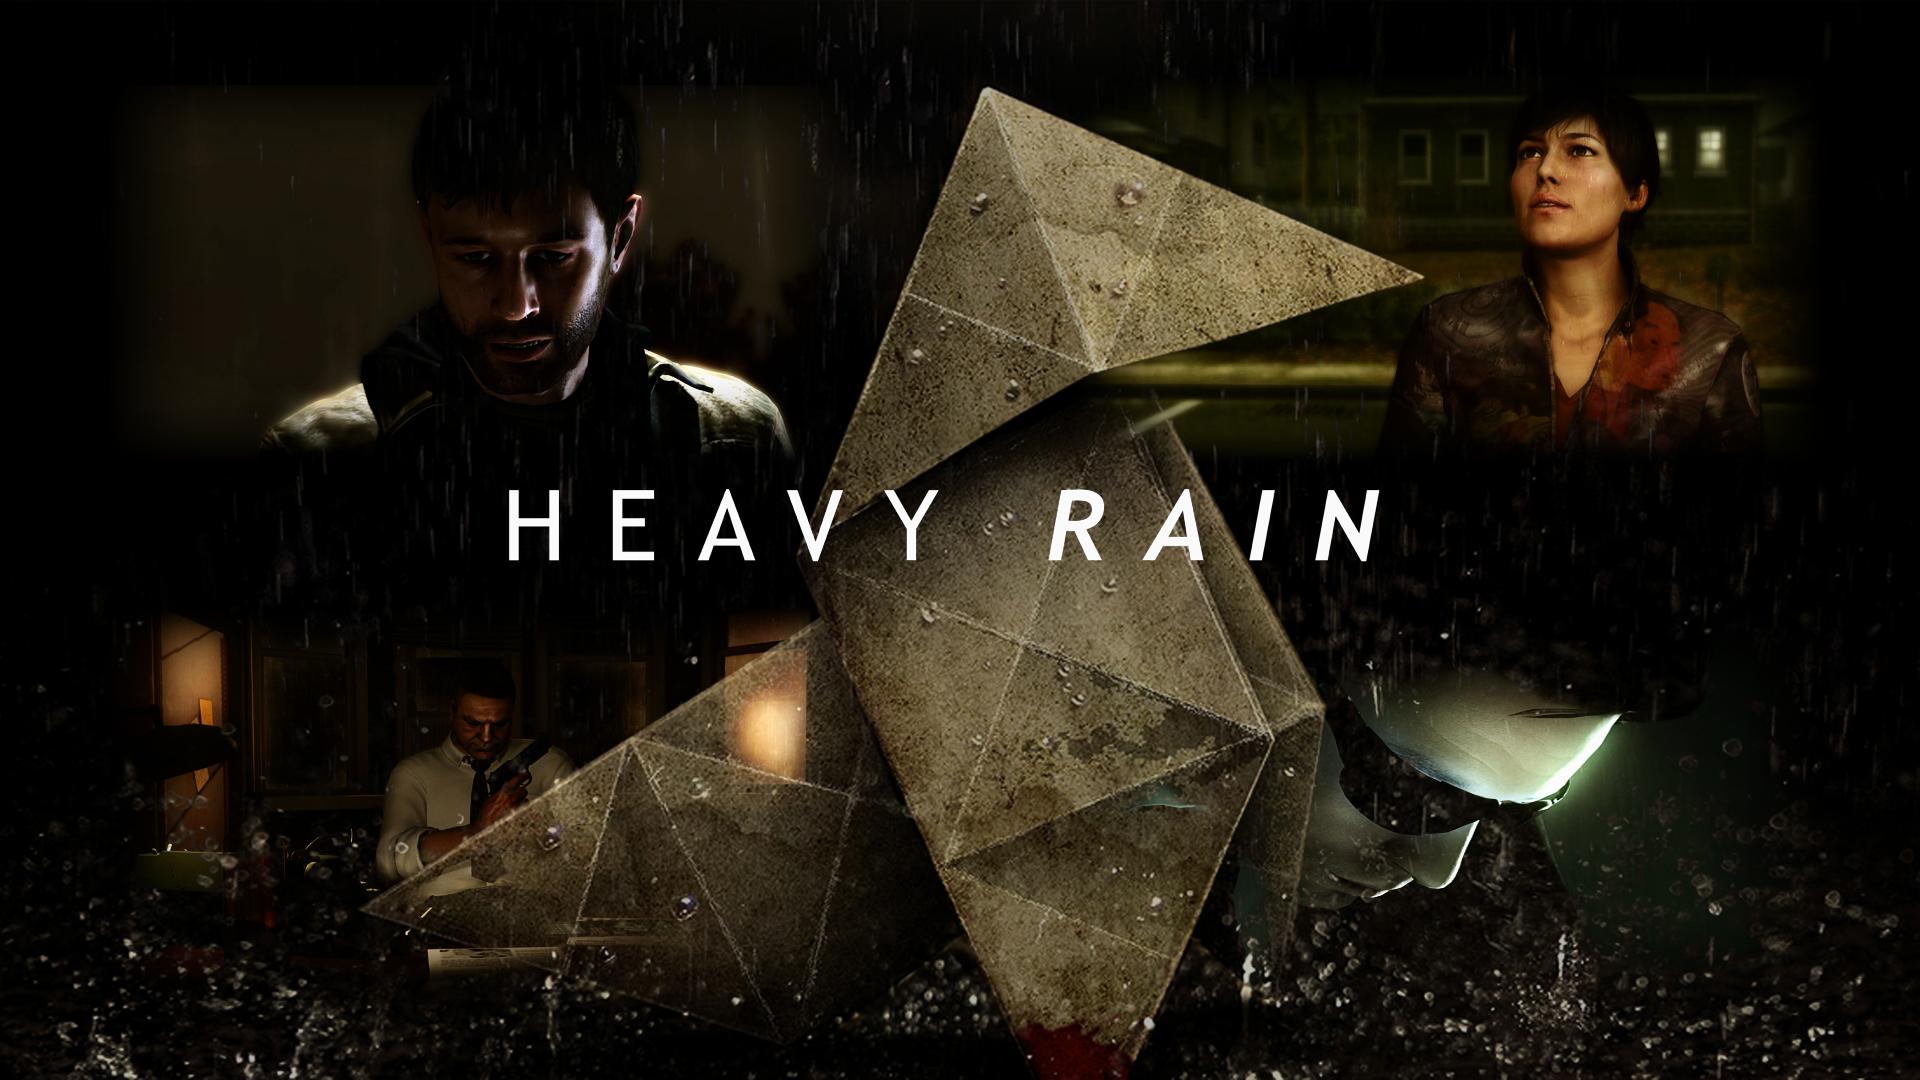 HQ Heavy Rain Wallpapers | File 2162.28Kb